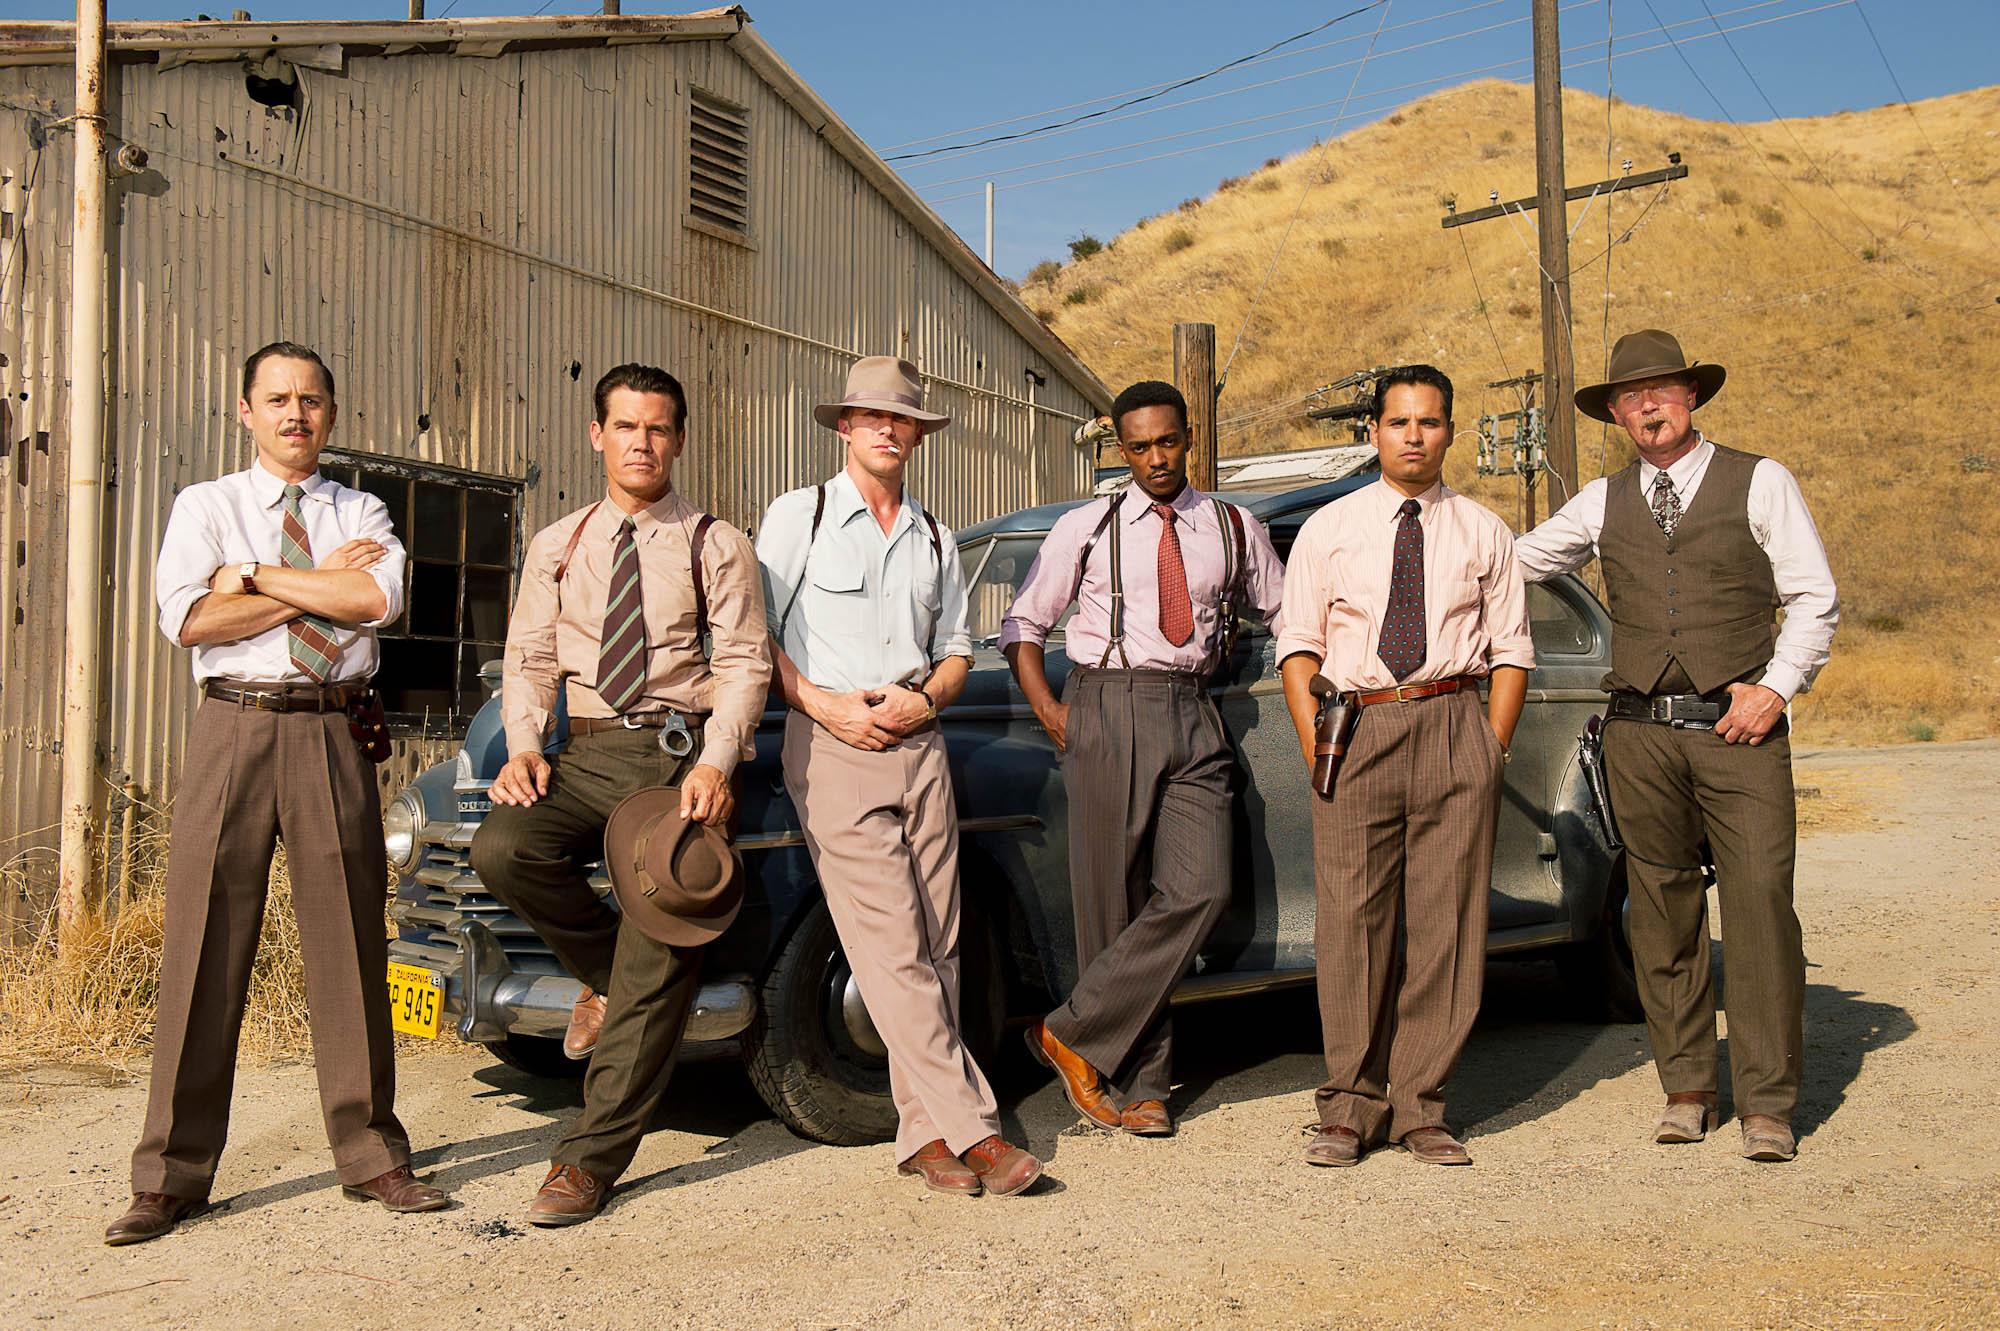 Zero Dark Thirty vs. Gangster Squad: Does Right Make Might? - JR ...